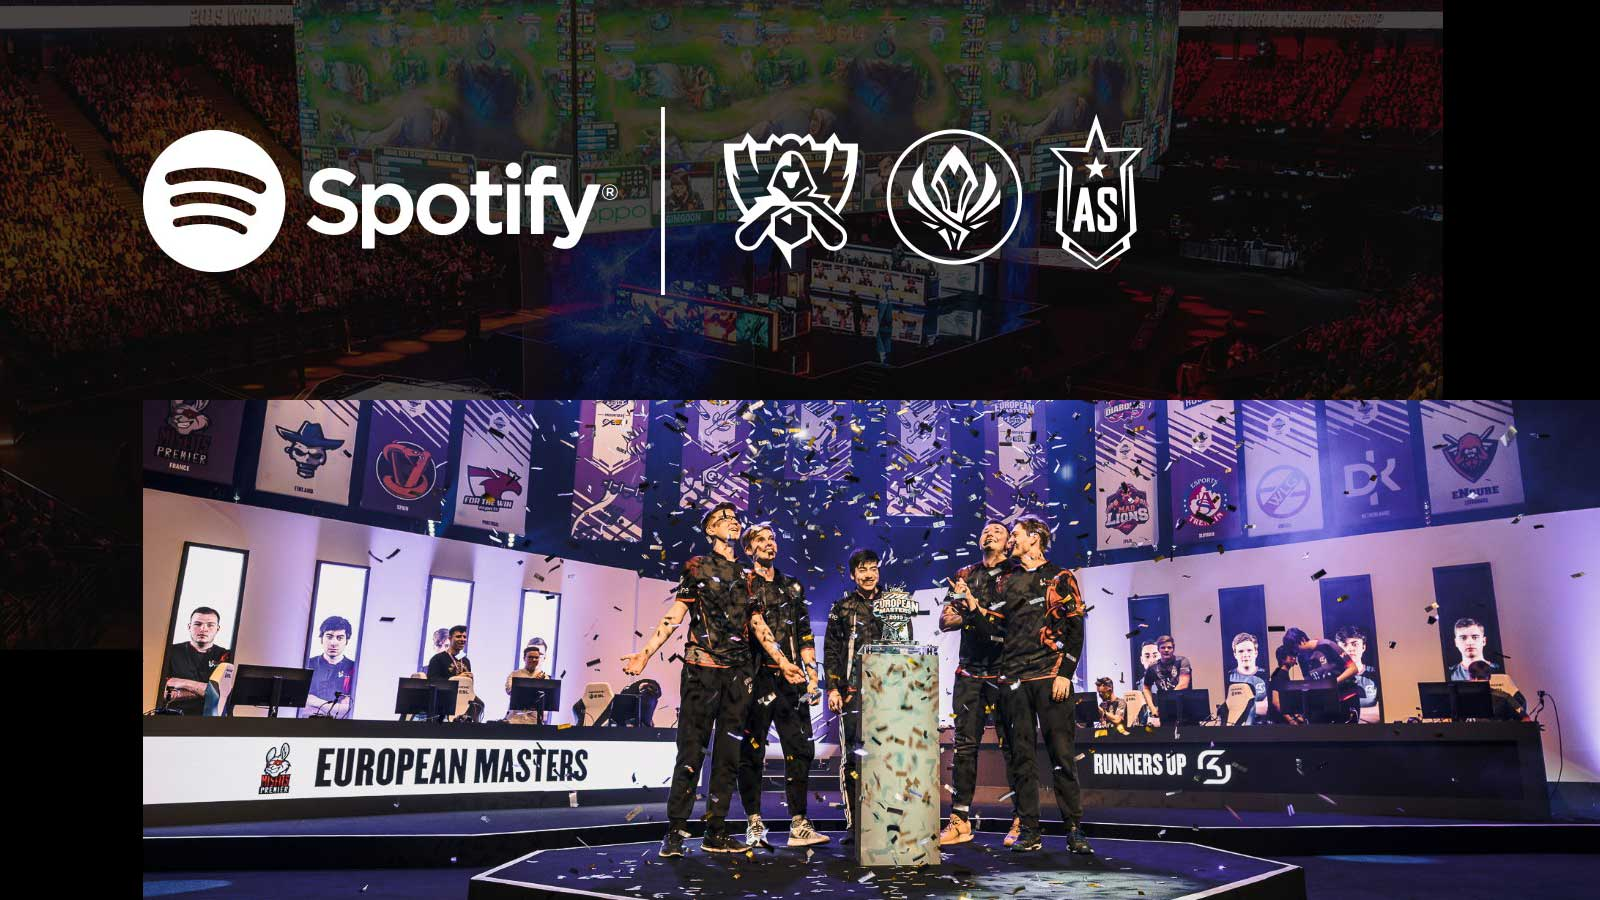 Spotify lolesports partnership 1600x900 1 babt